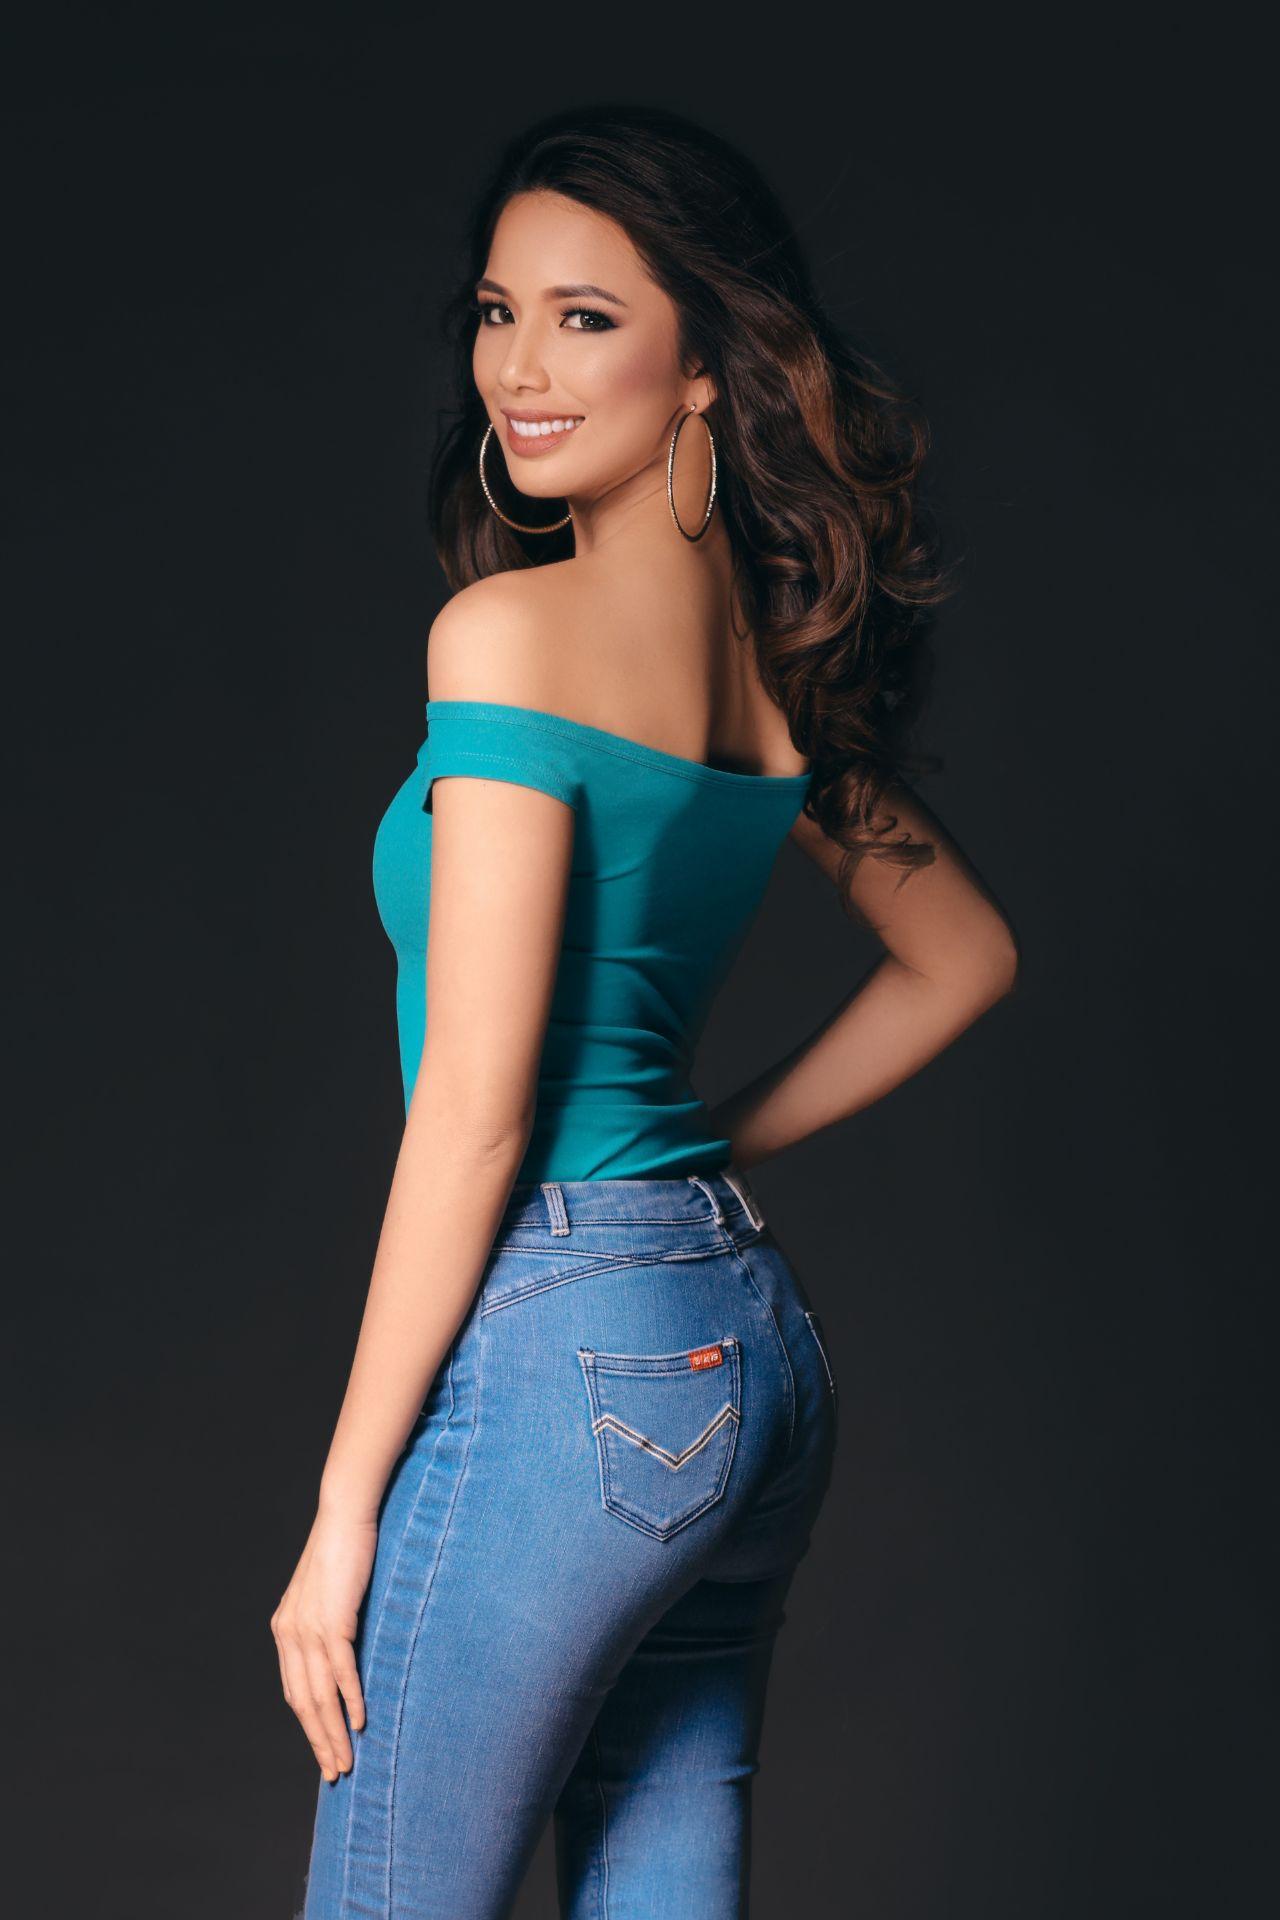 Joahnna Carla Saad